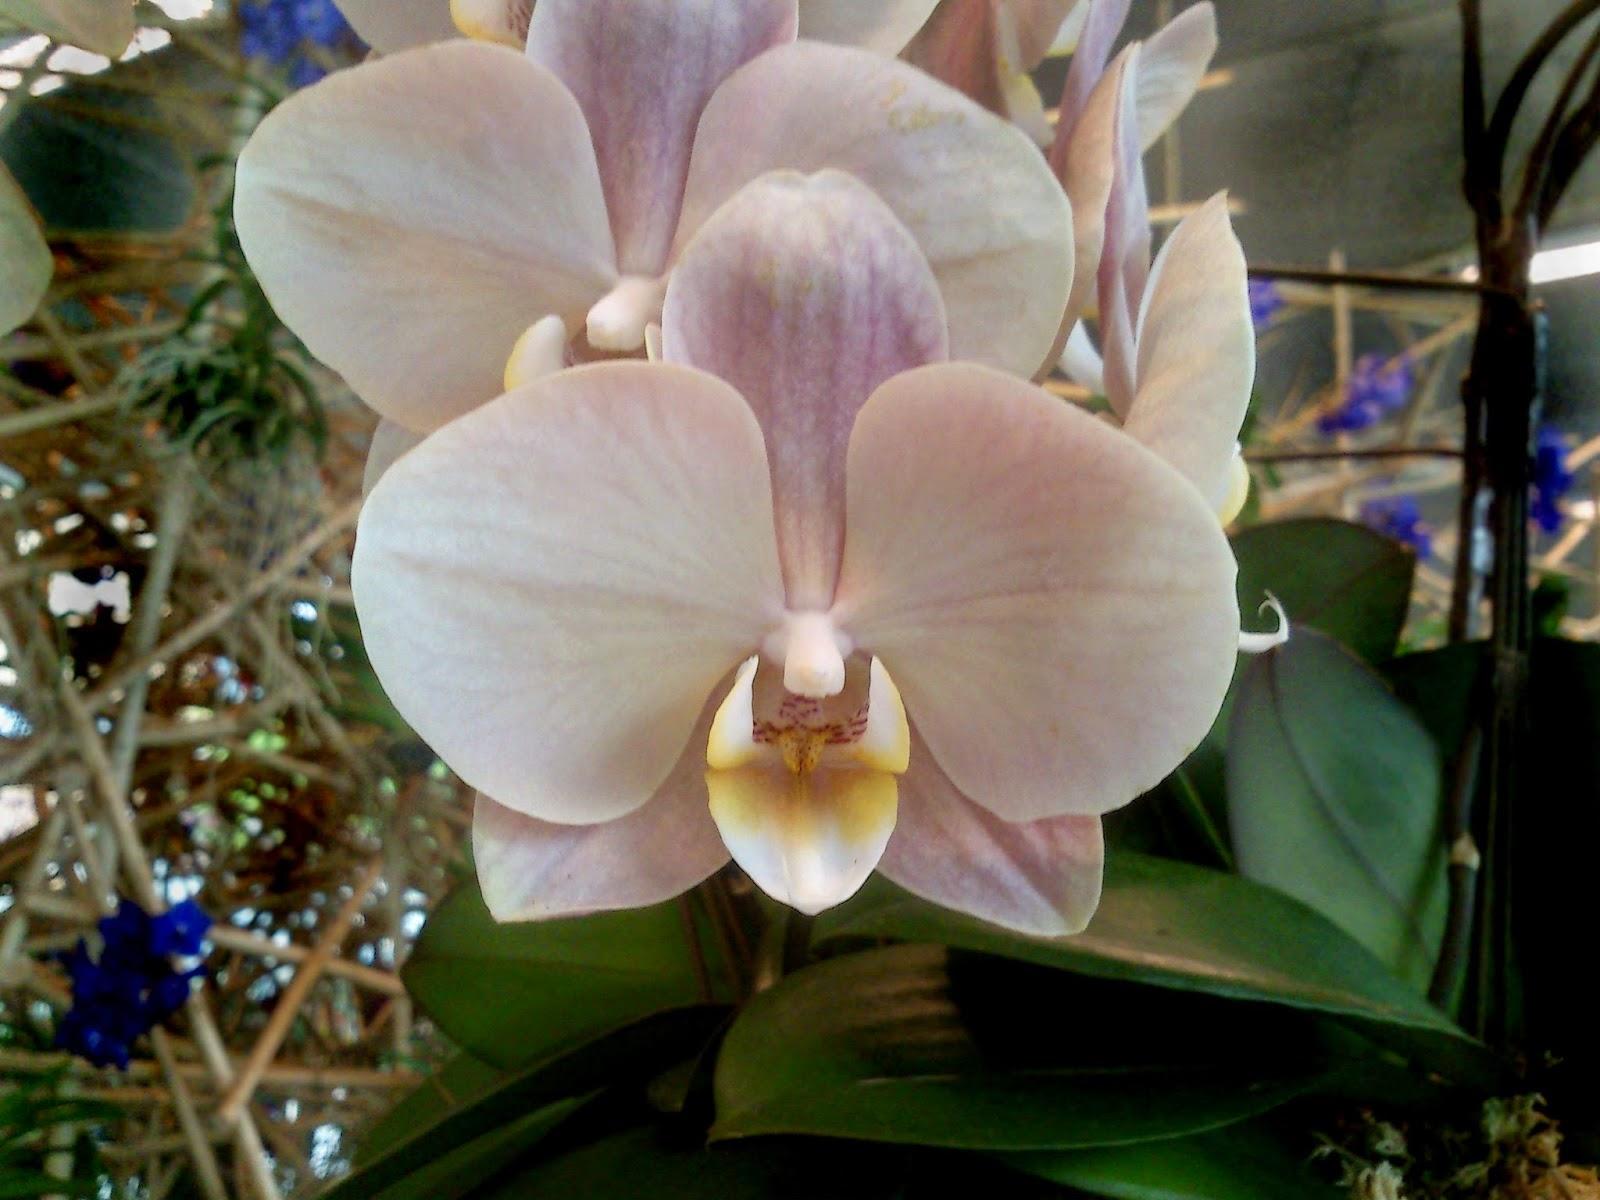 Phalaenopsis i blomst